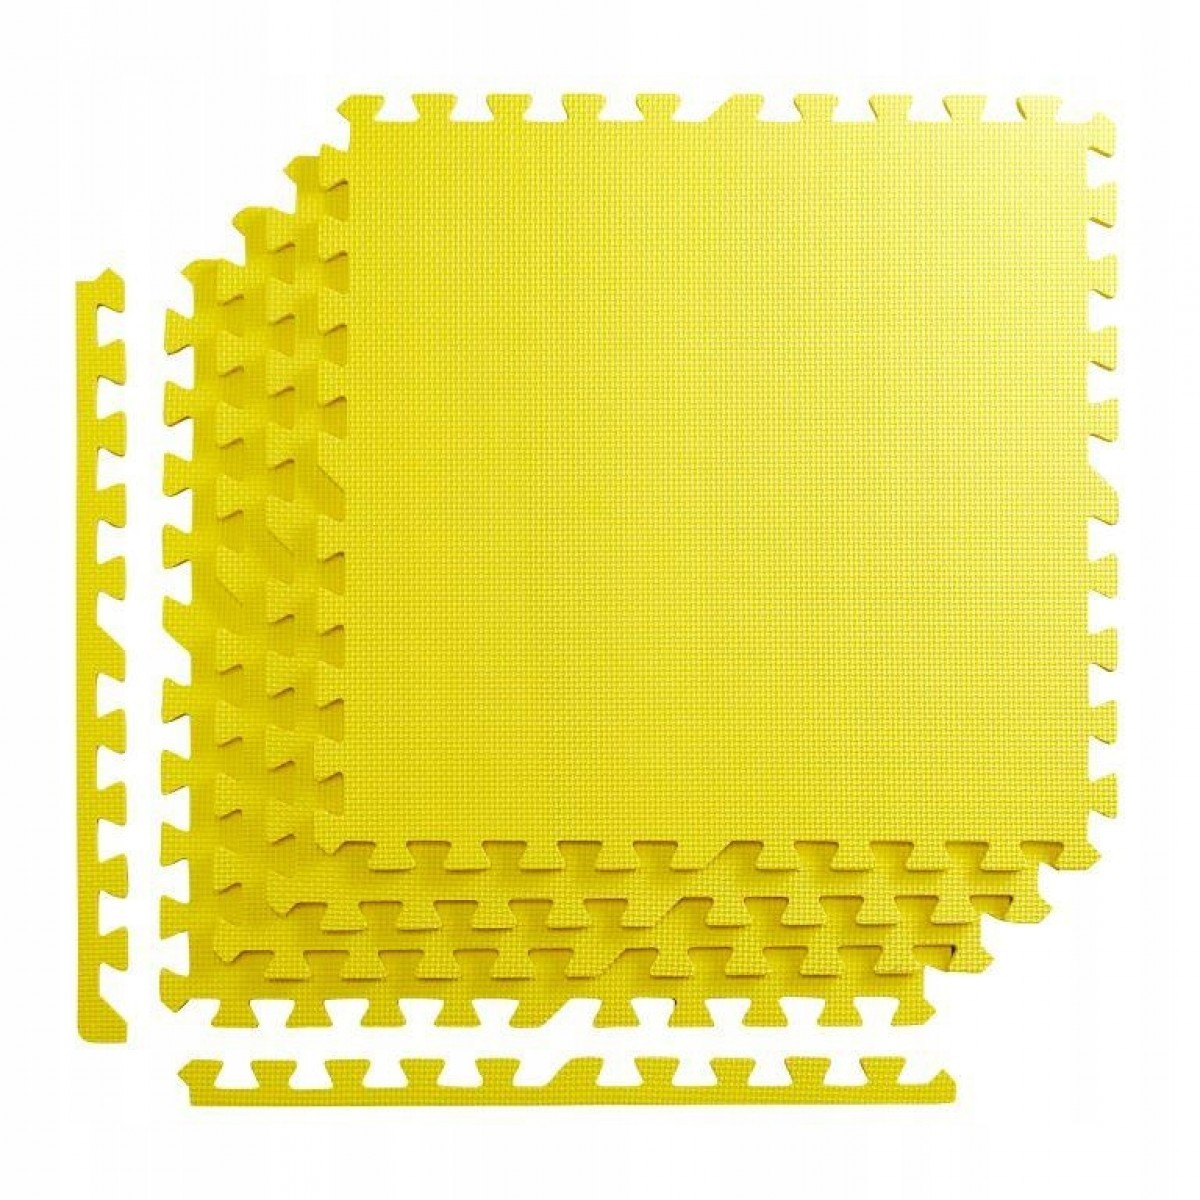 Мат пазл (ласточкин хвост) коврик татами 4FIZJO Mat Puzzle EVA 120 x 120 x 1 cм 4FJ0076 Yellow